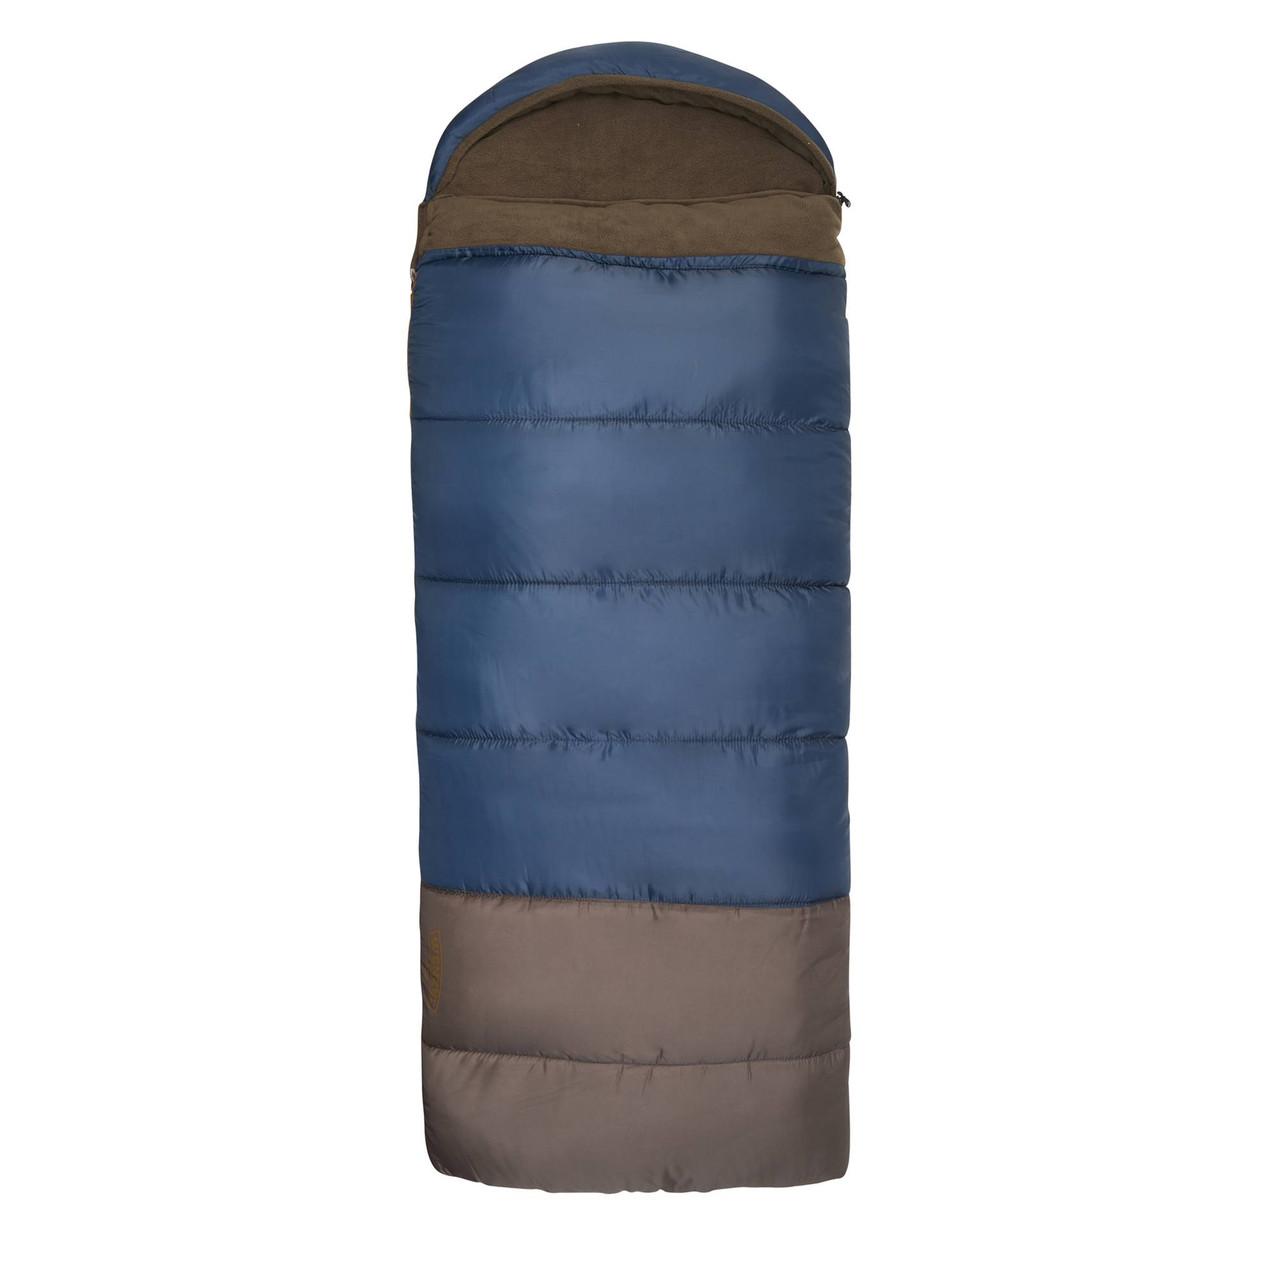 Wenzel Monterey Sleeping Bag, blue, shown fully zipped